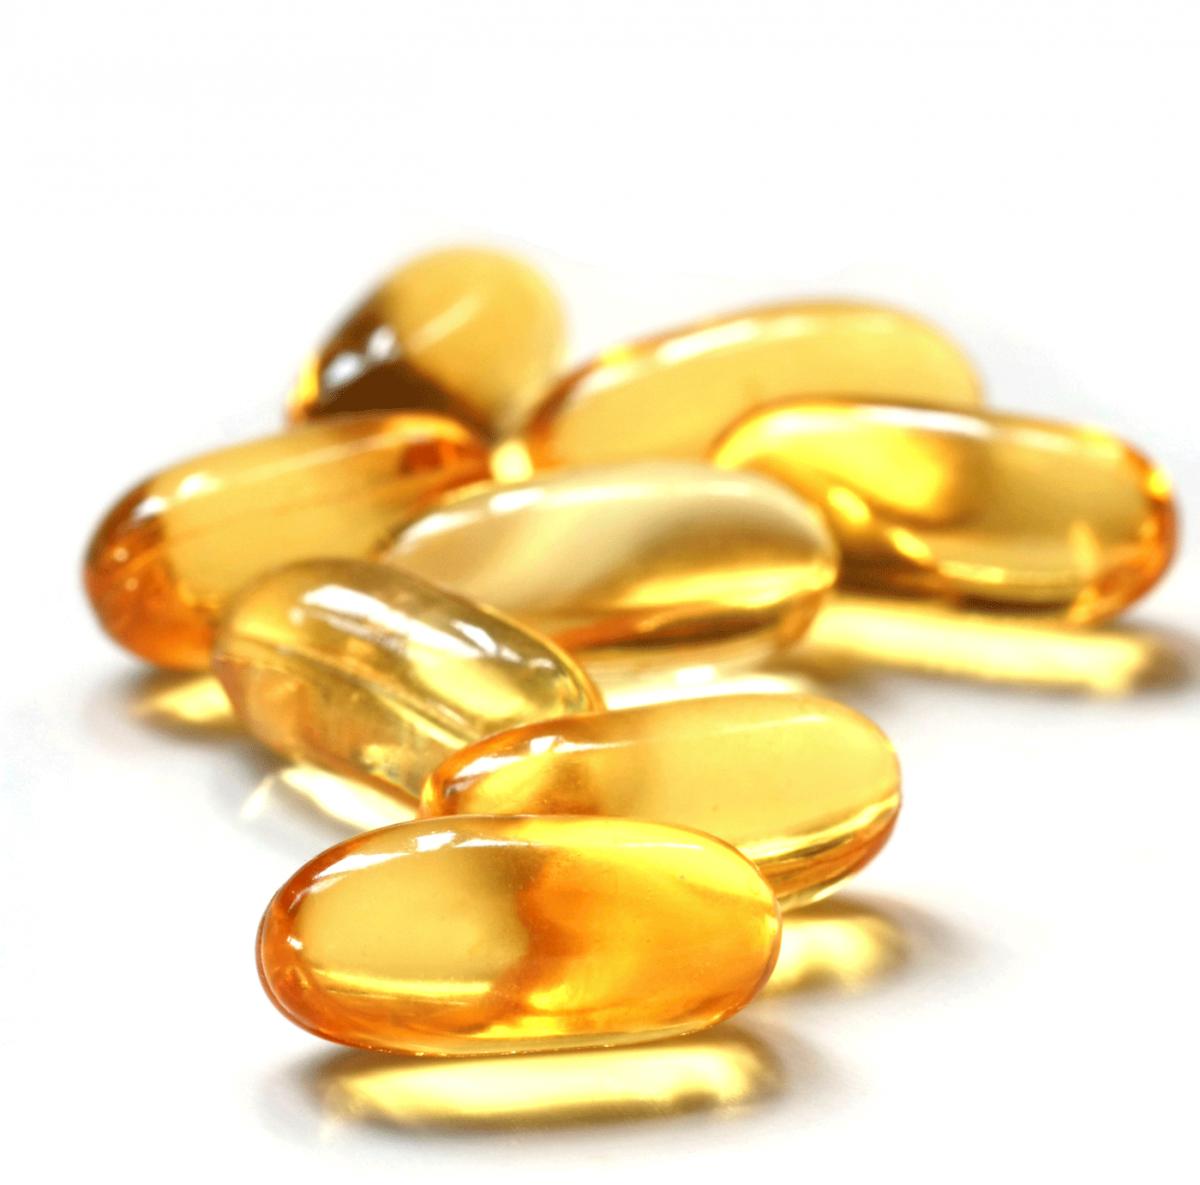 dưỡng da mặt bằng vitamin e tại nhà